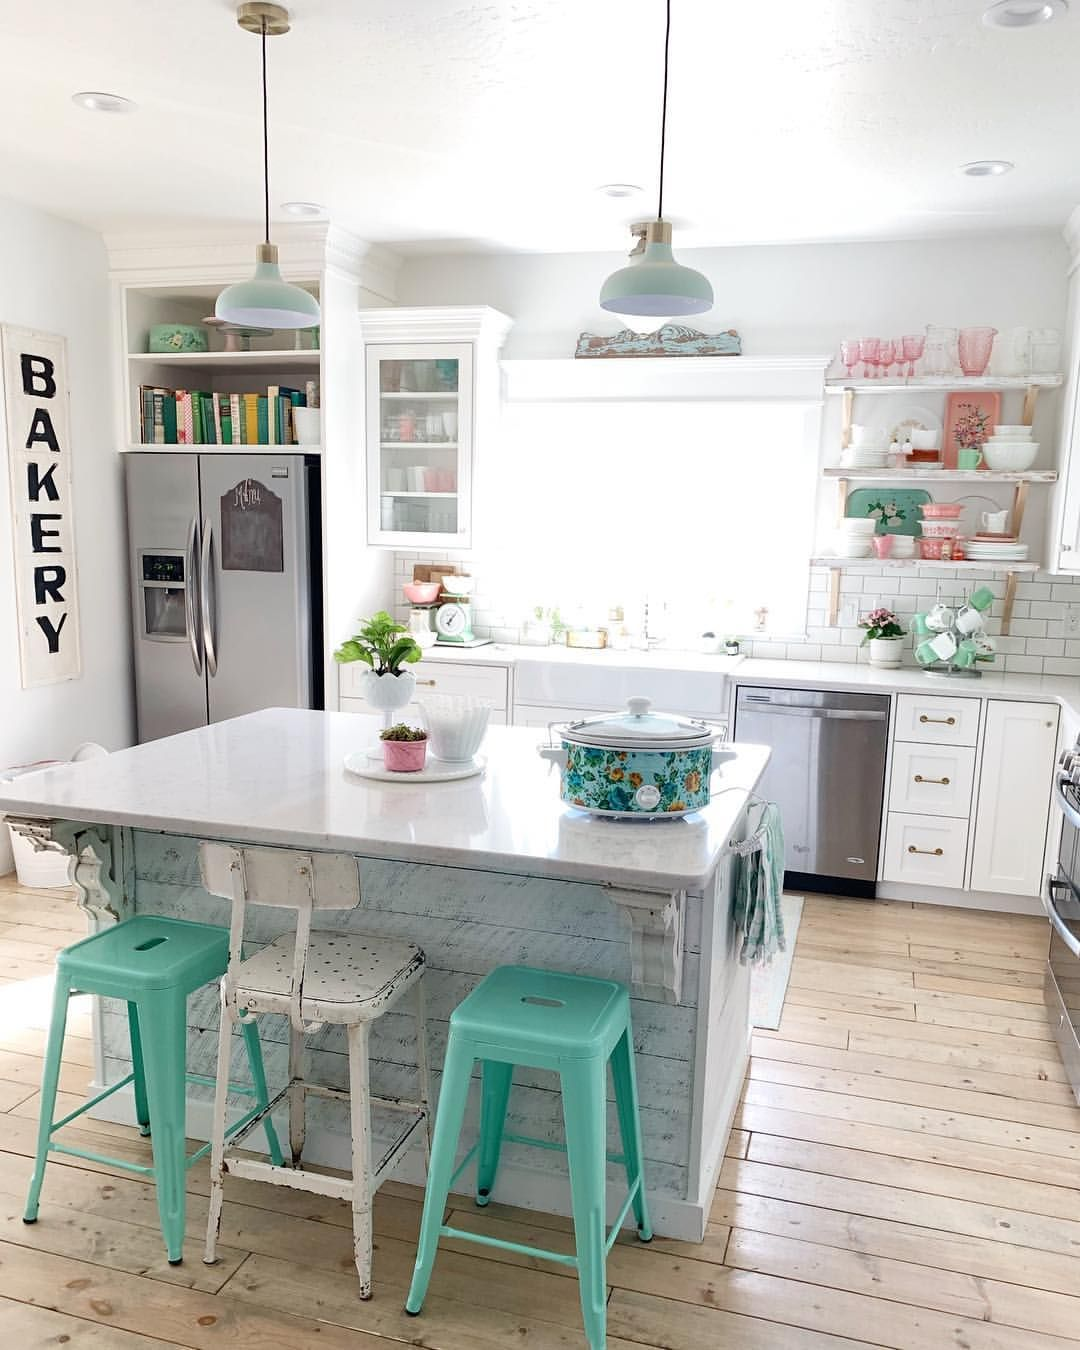 Best Way To Clean Kitchen Floor: Clean Kitchen 🧼, Dinner In The Crock Pot 🥘 And I Got My